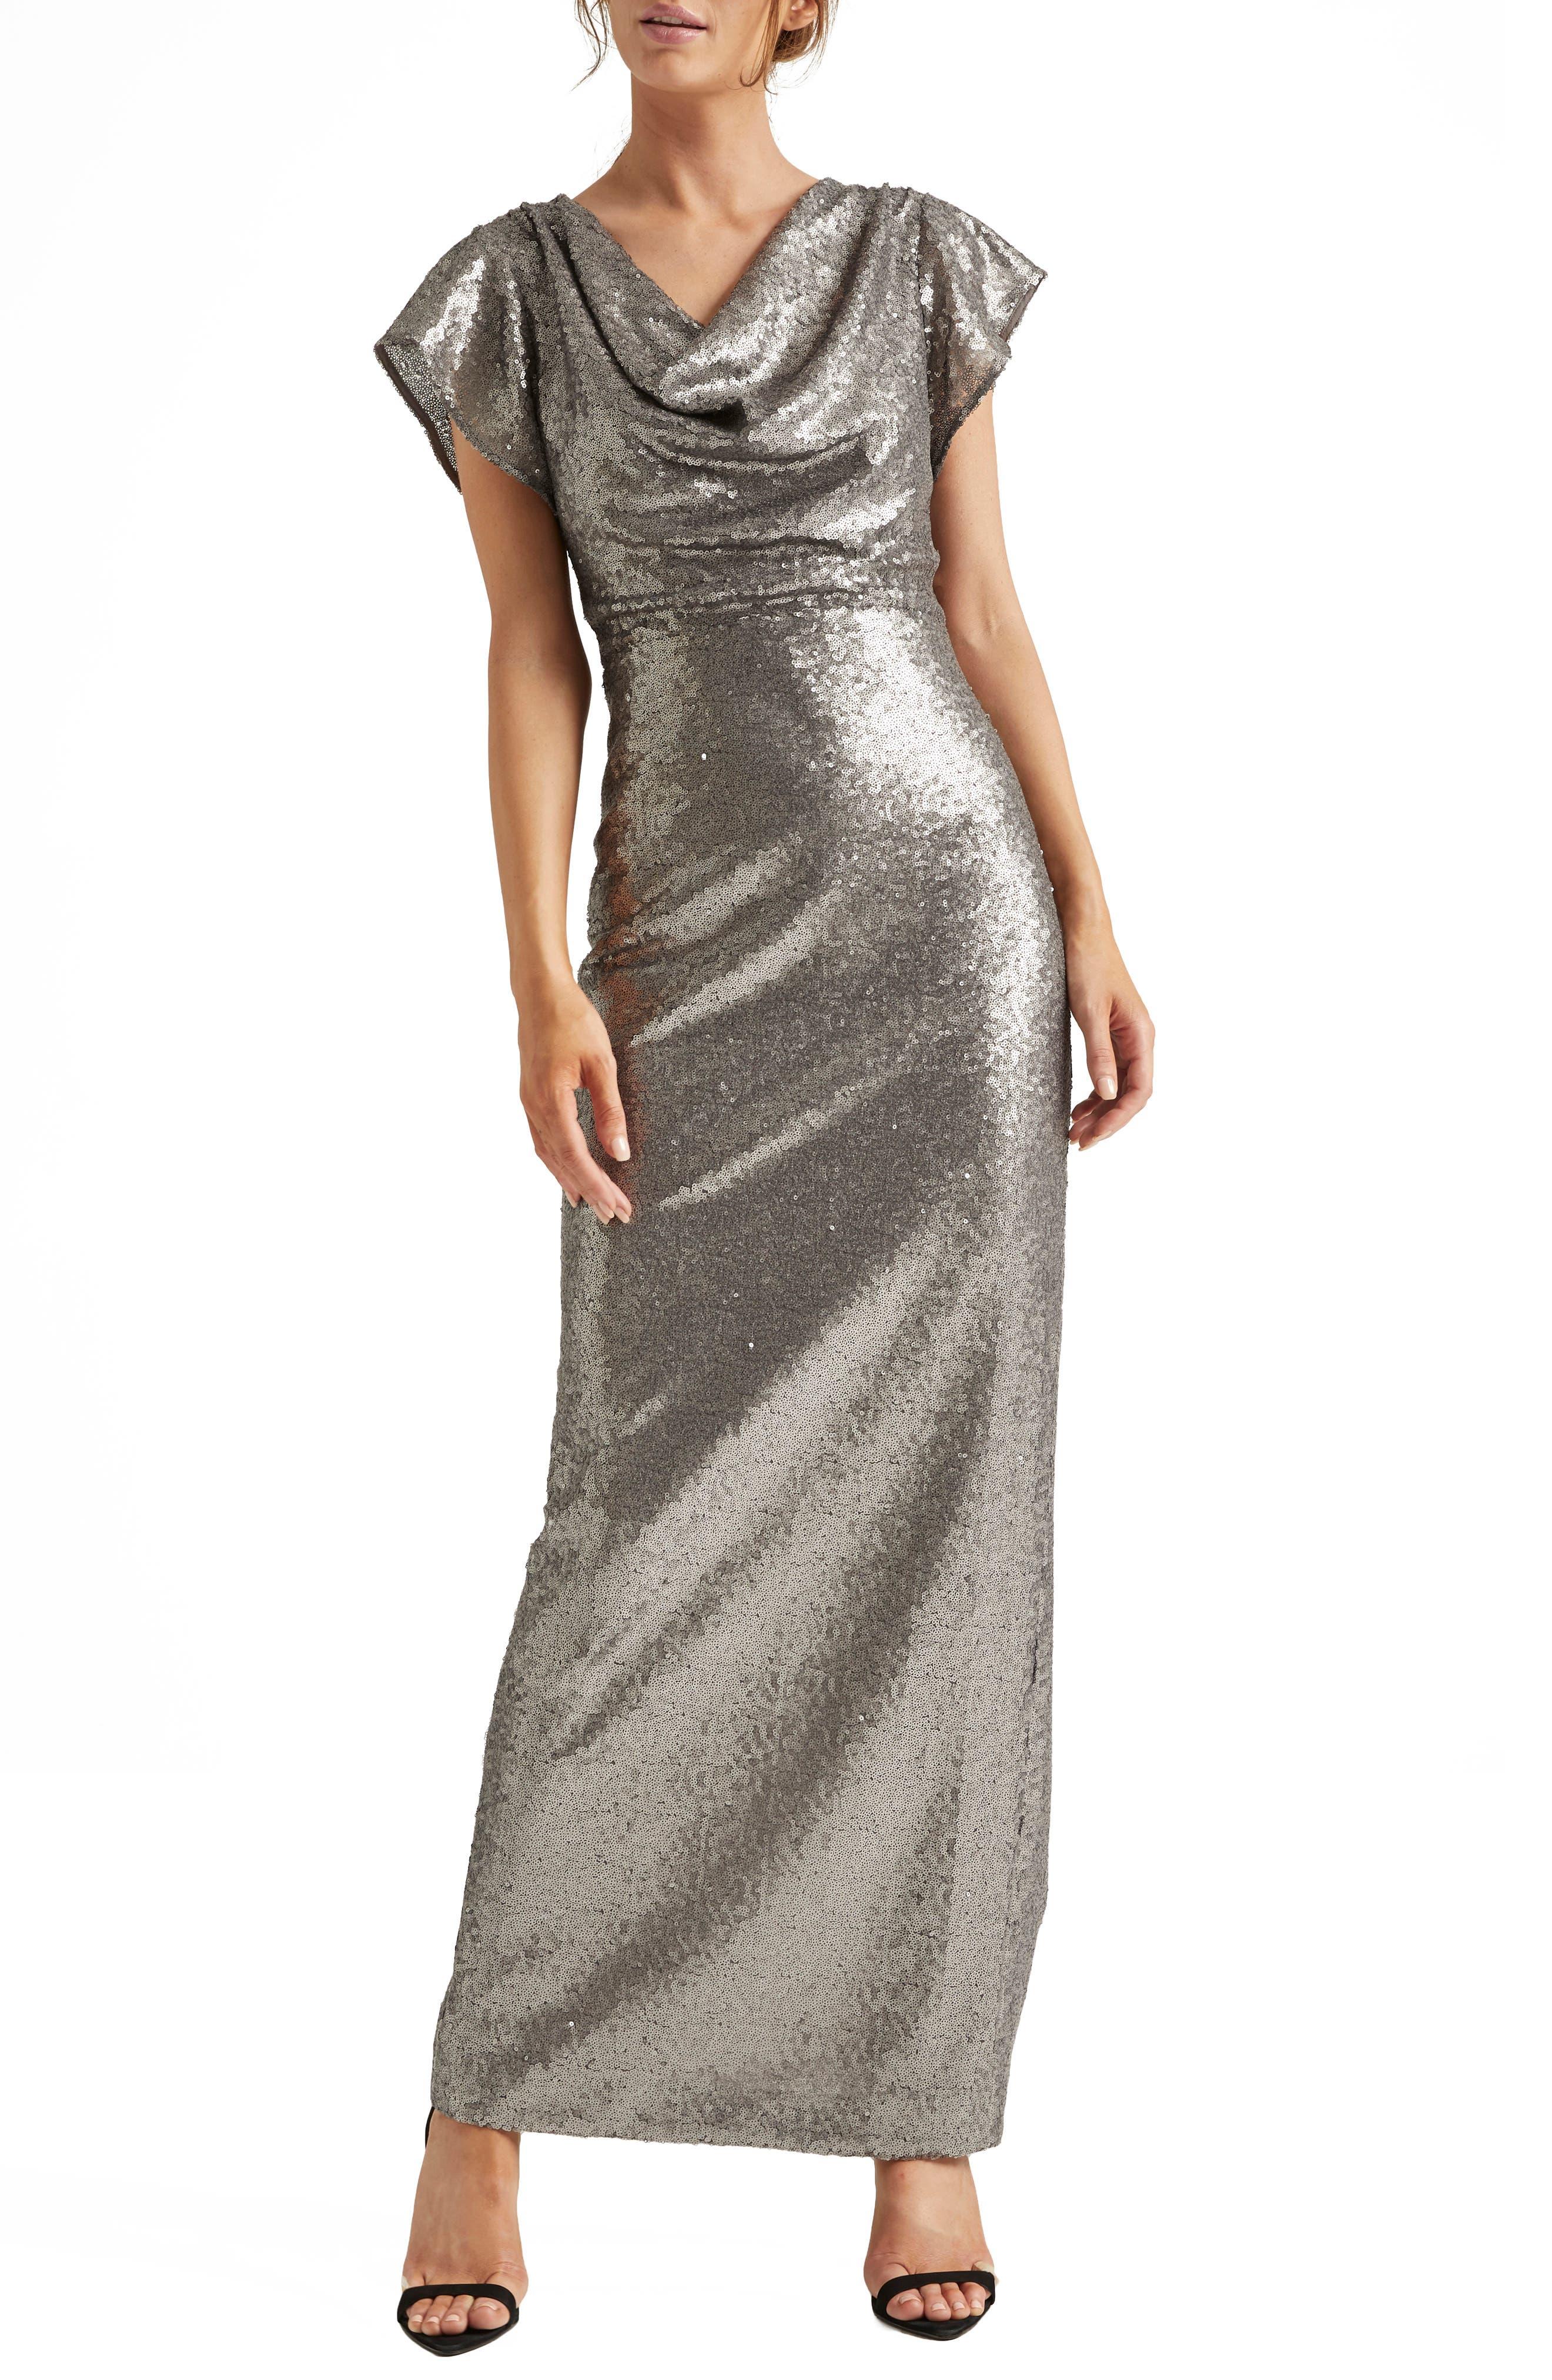 70s Prom, Formal, Evening, Party Dresses Womens Halston Heritage Cowl Neck Sequin Column Gown $209.00 AT vintagedancer.com